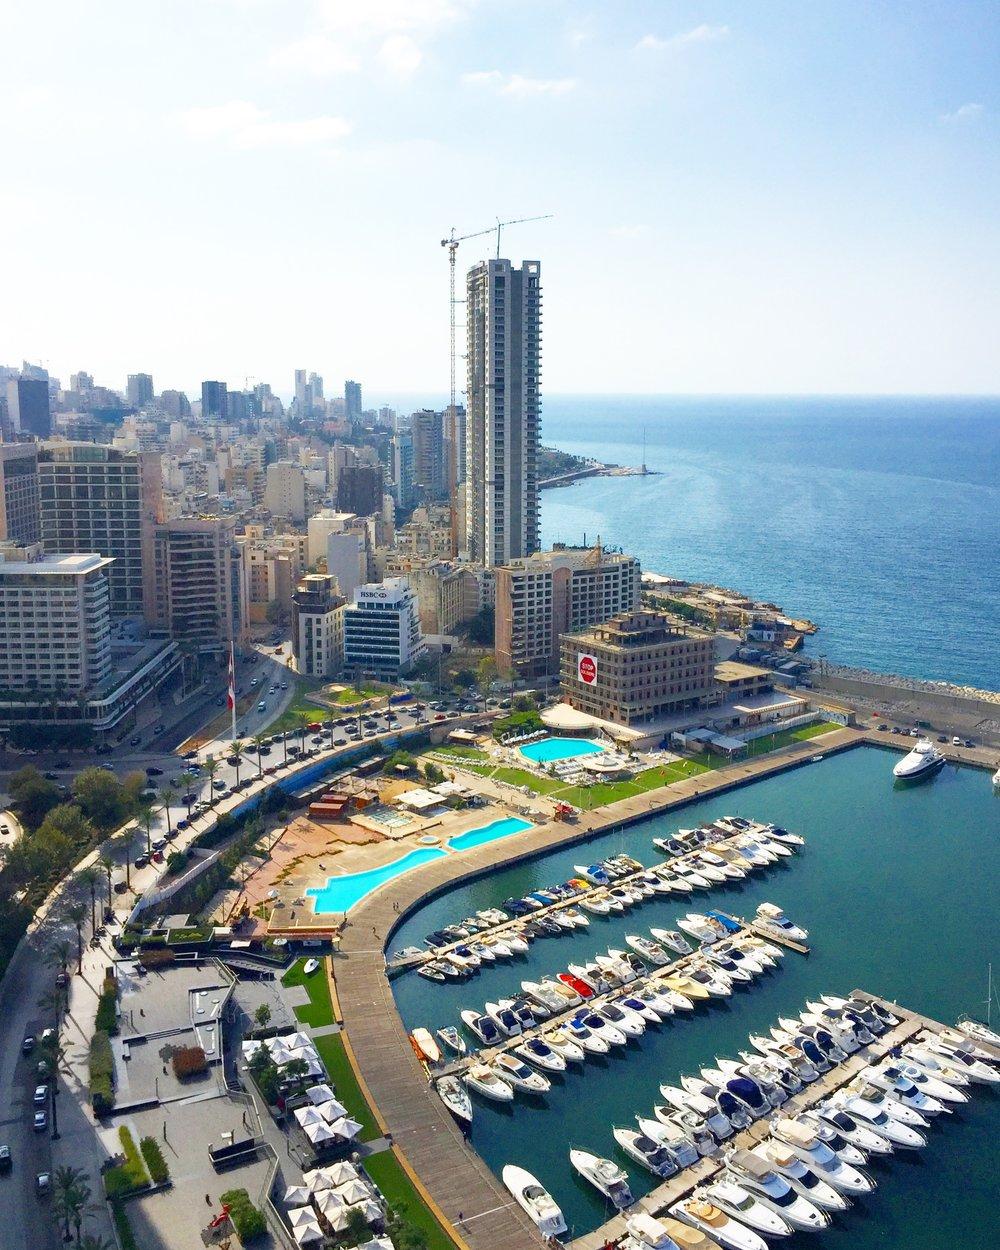 Maria-Brito_Beirut-33.jpg